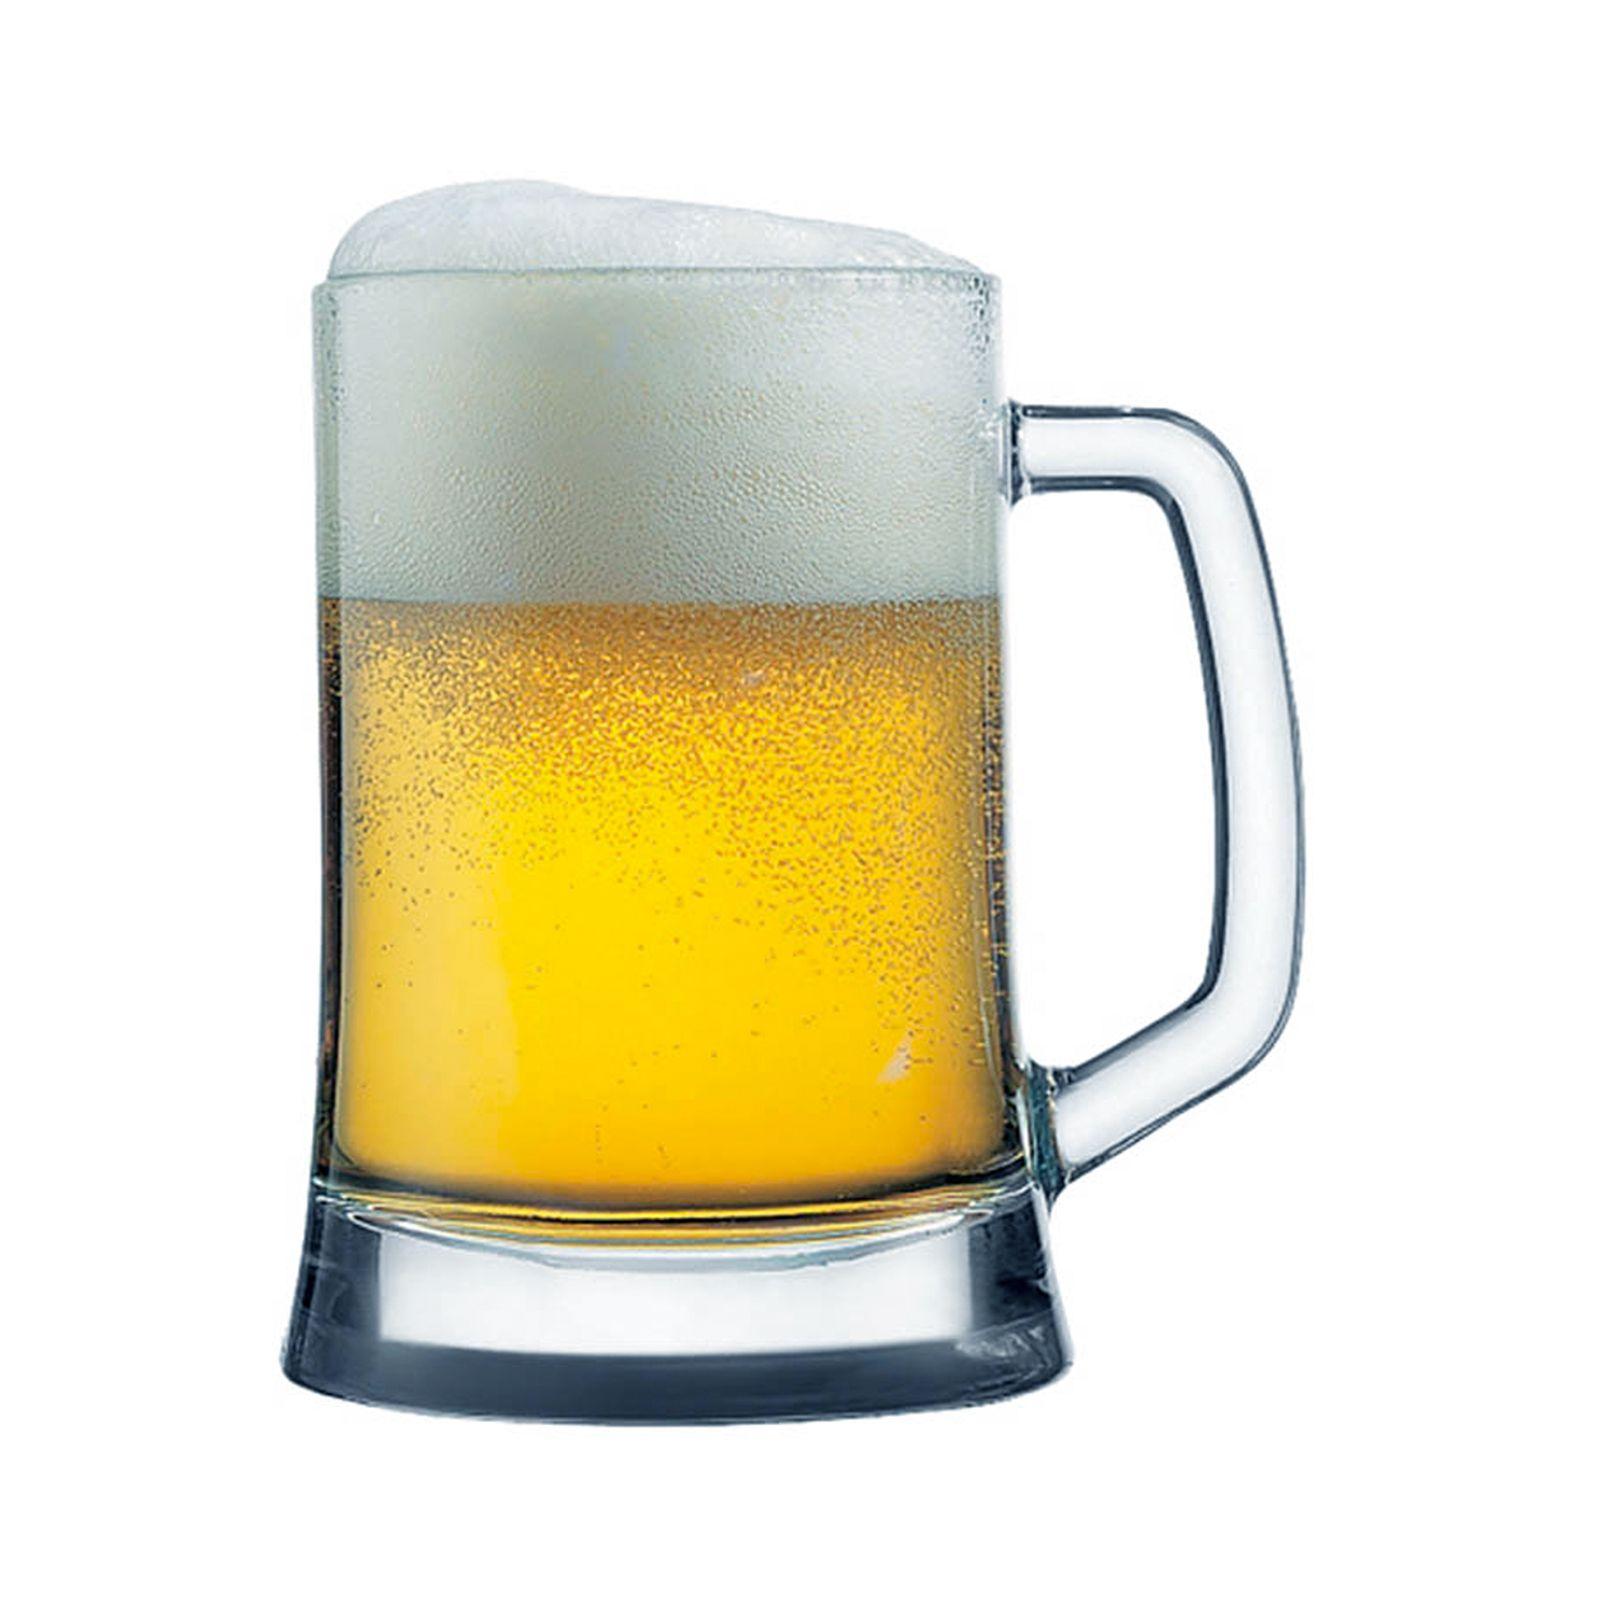 Beer mug Bremen / Star 660 ml PASABAHCE